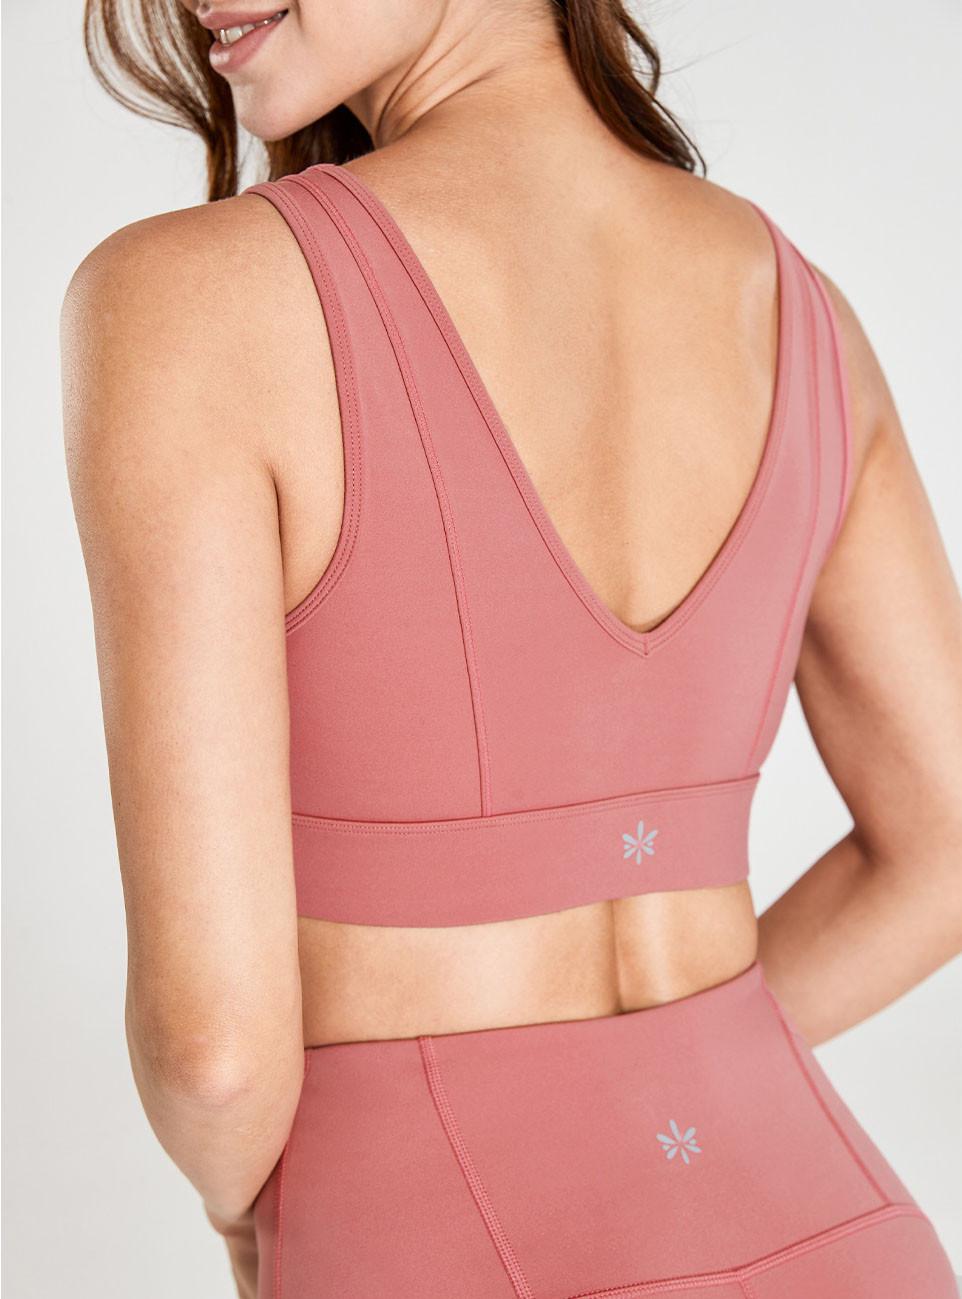 Peach Pink Back Deep V Bra Distributor